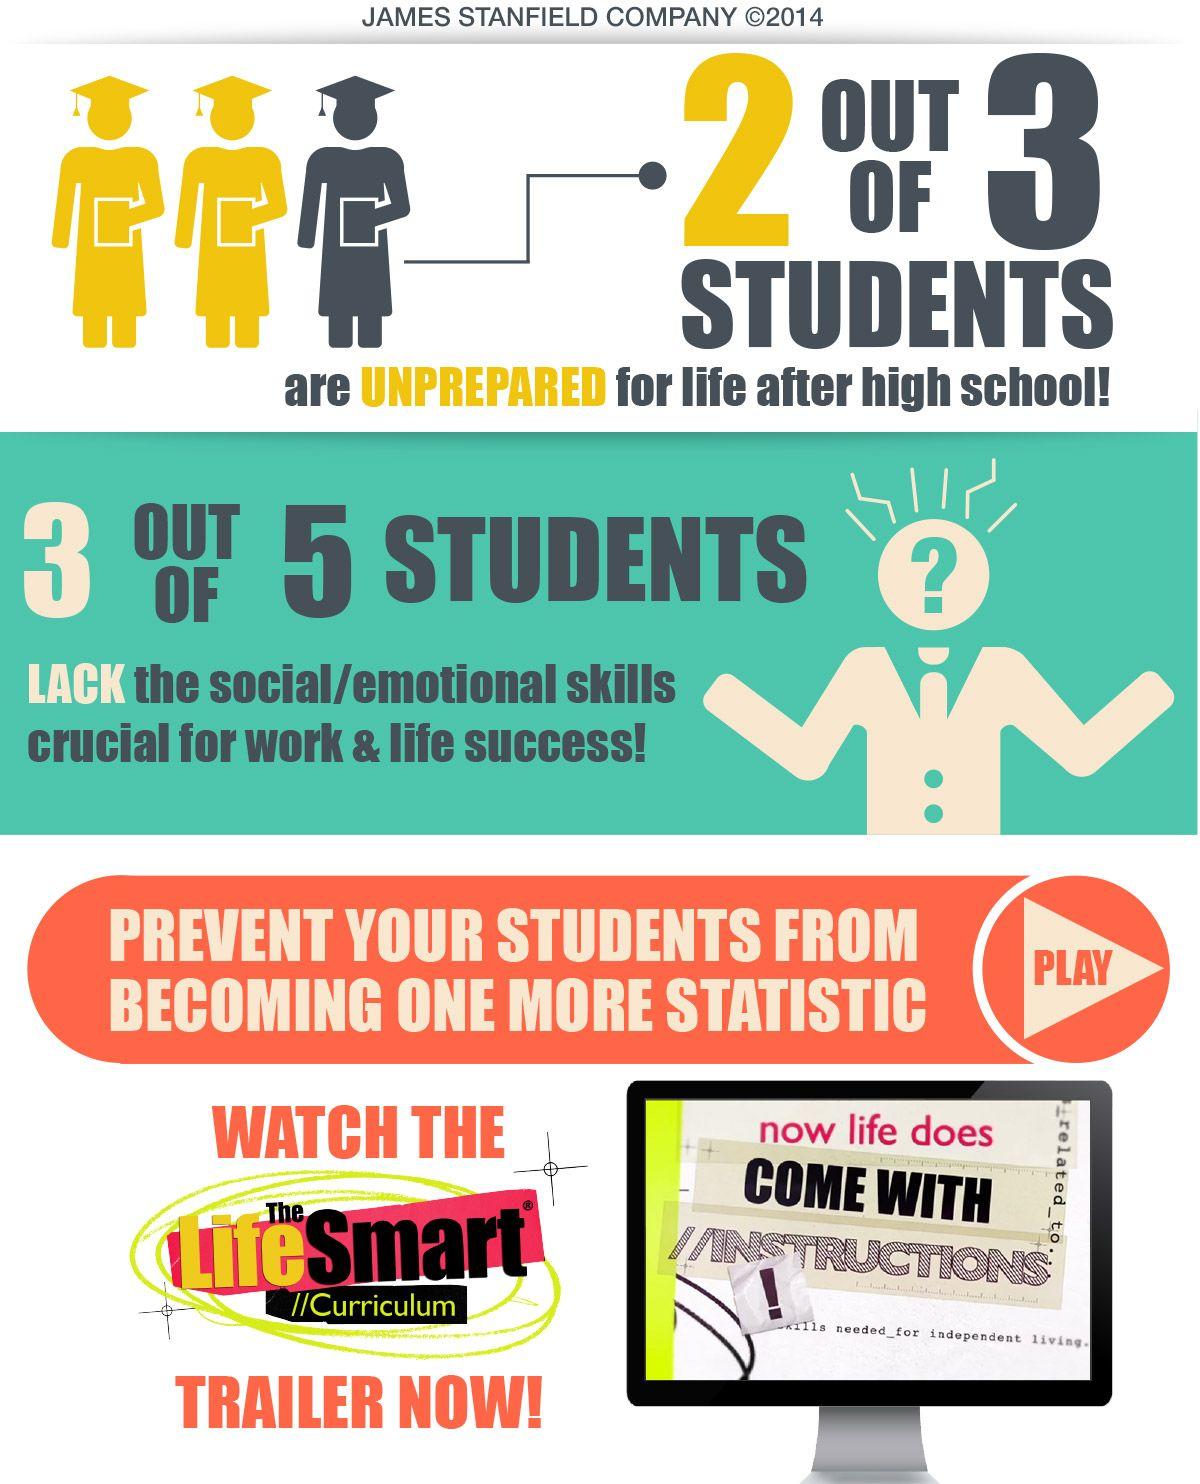 The LifeSmart Curriculum Life after high school, Life